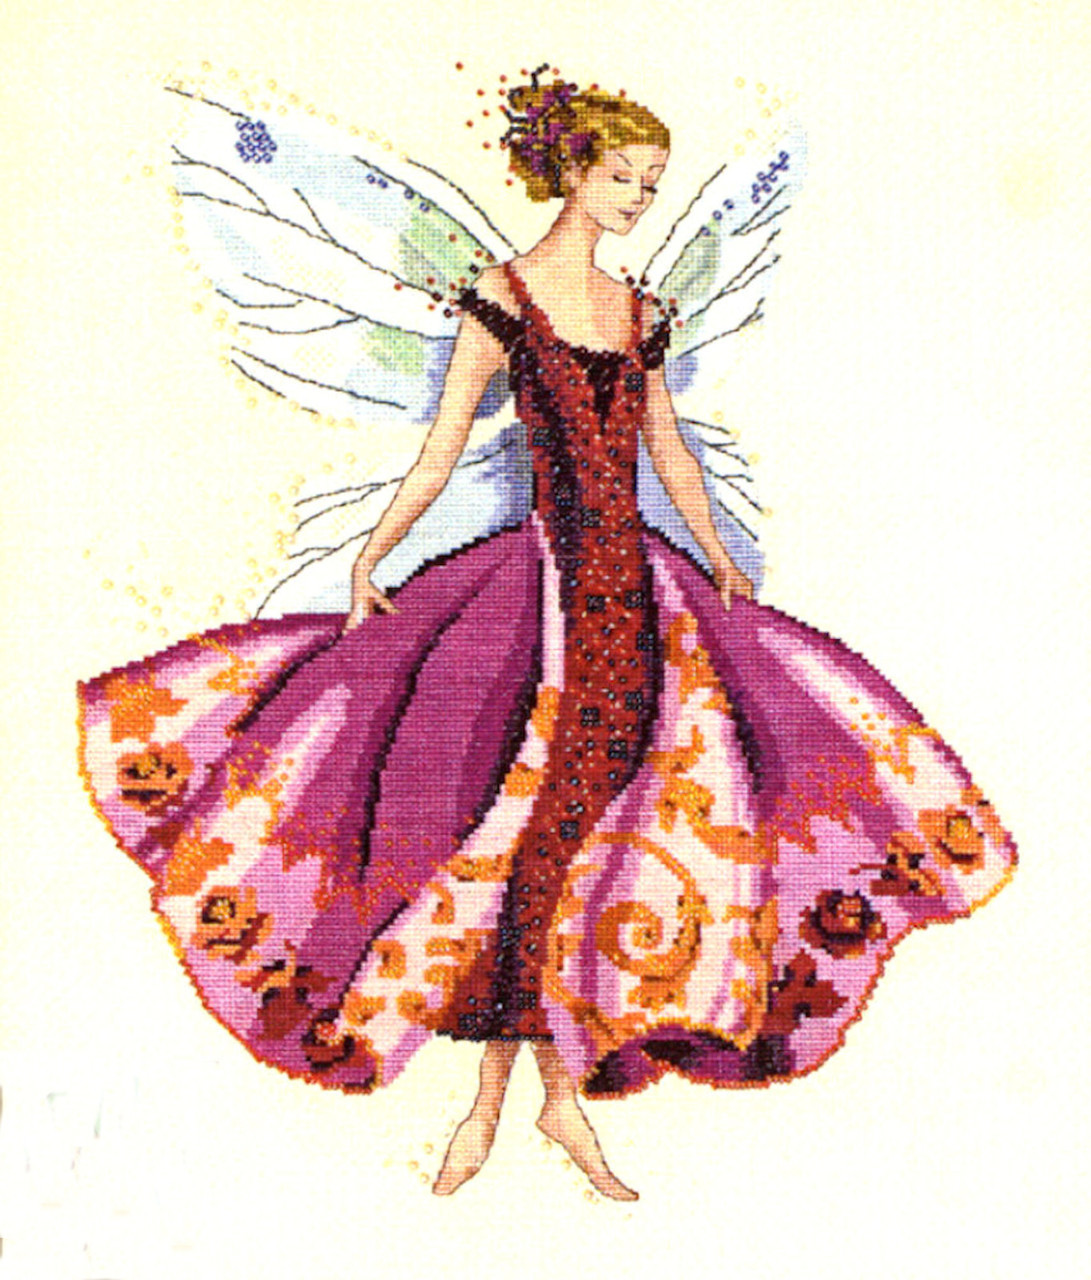 Mirabilia Embellishment Pack - January Garnet Fairy